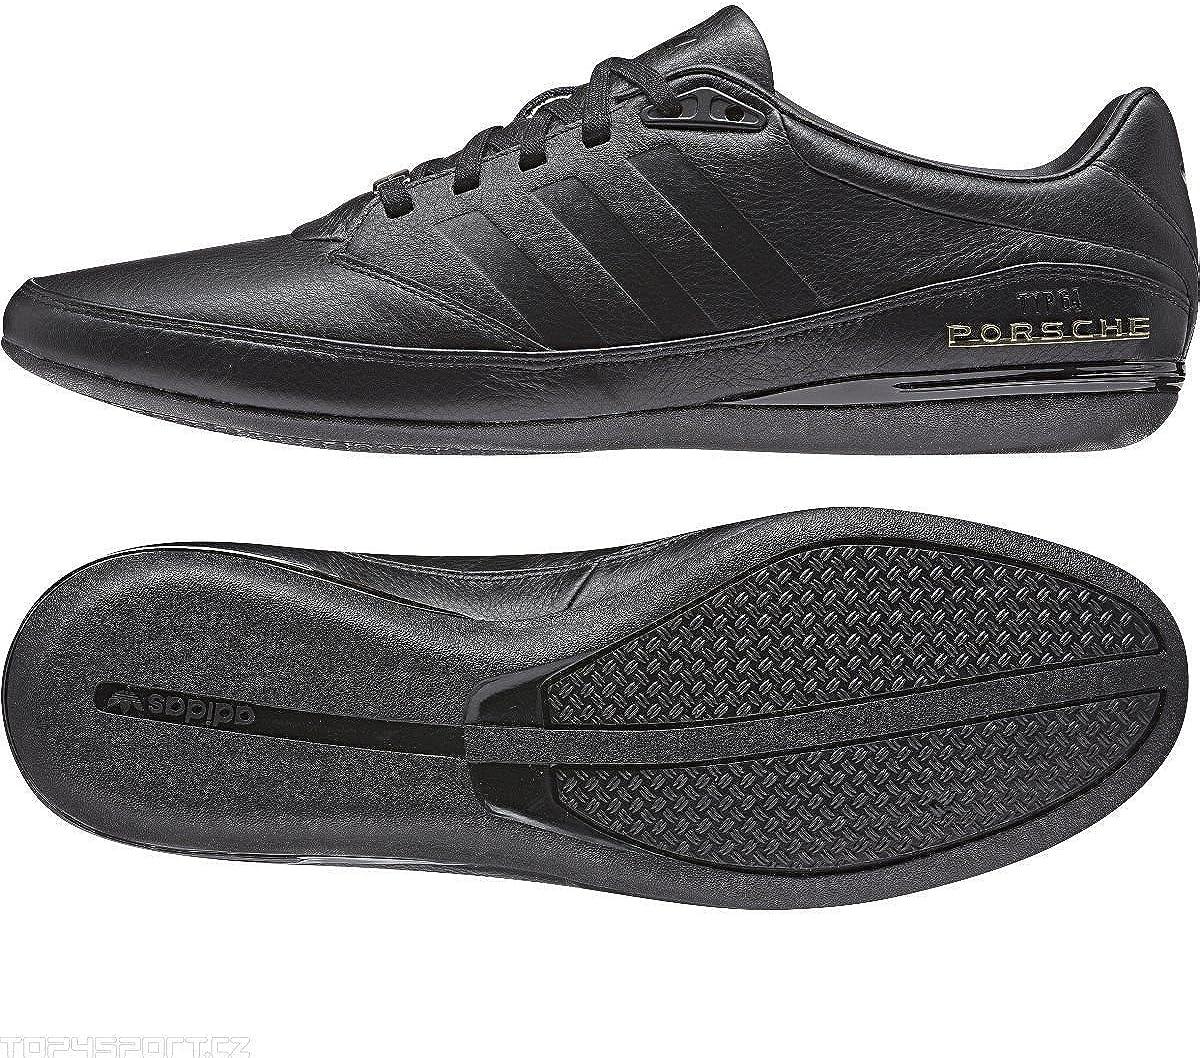 Adidas Originals Porsche Design Typ 64